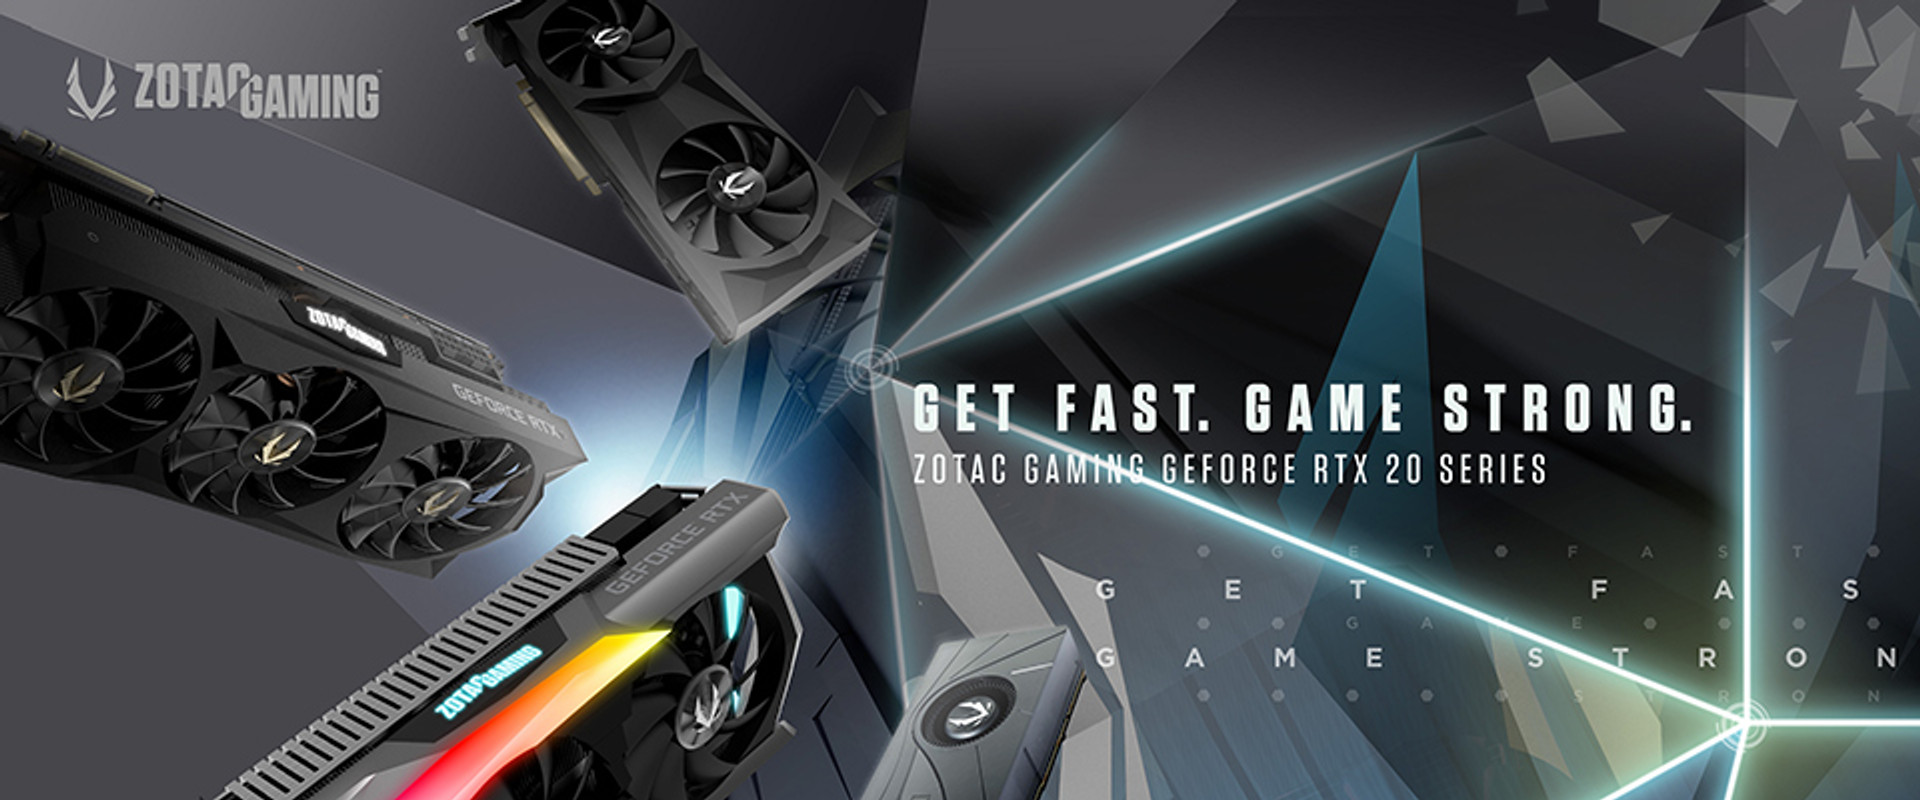 Zotac Gaming Components